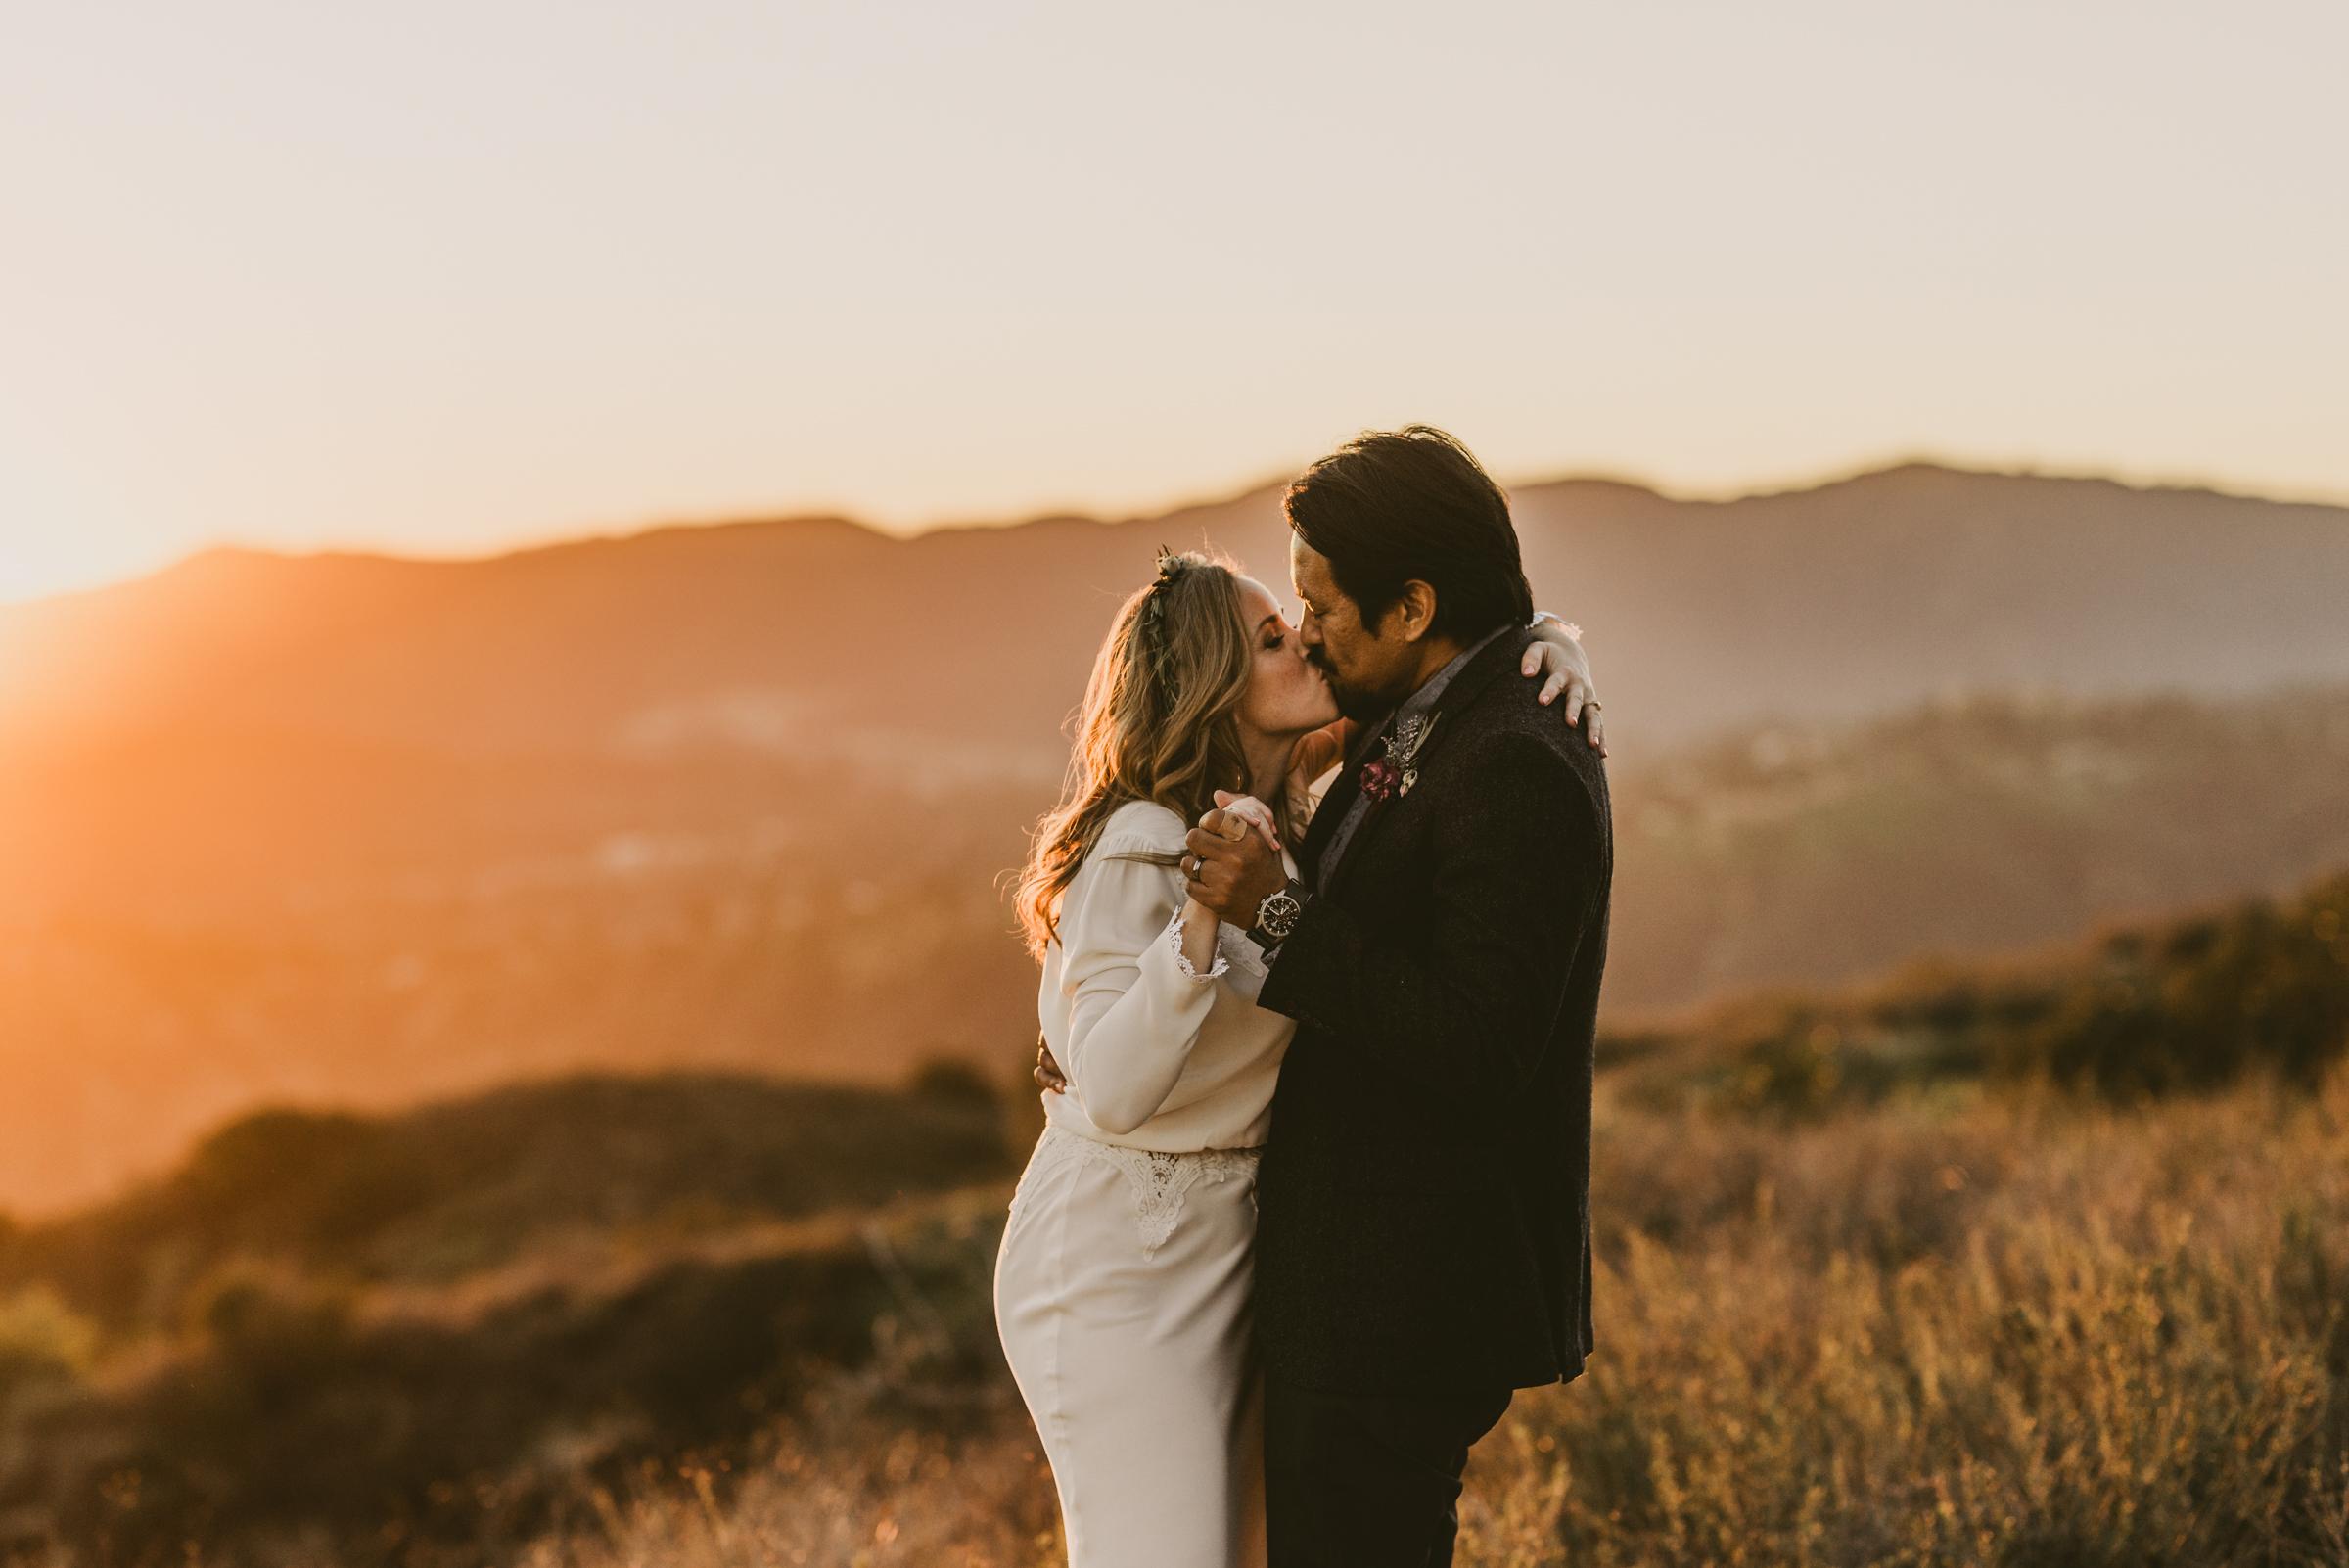 ©Isaiah + Taylor Photography - Intimate Elopement, Eaton Canyon, Los Angeles Wedding Photographer-95.jpg